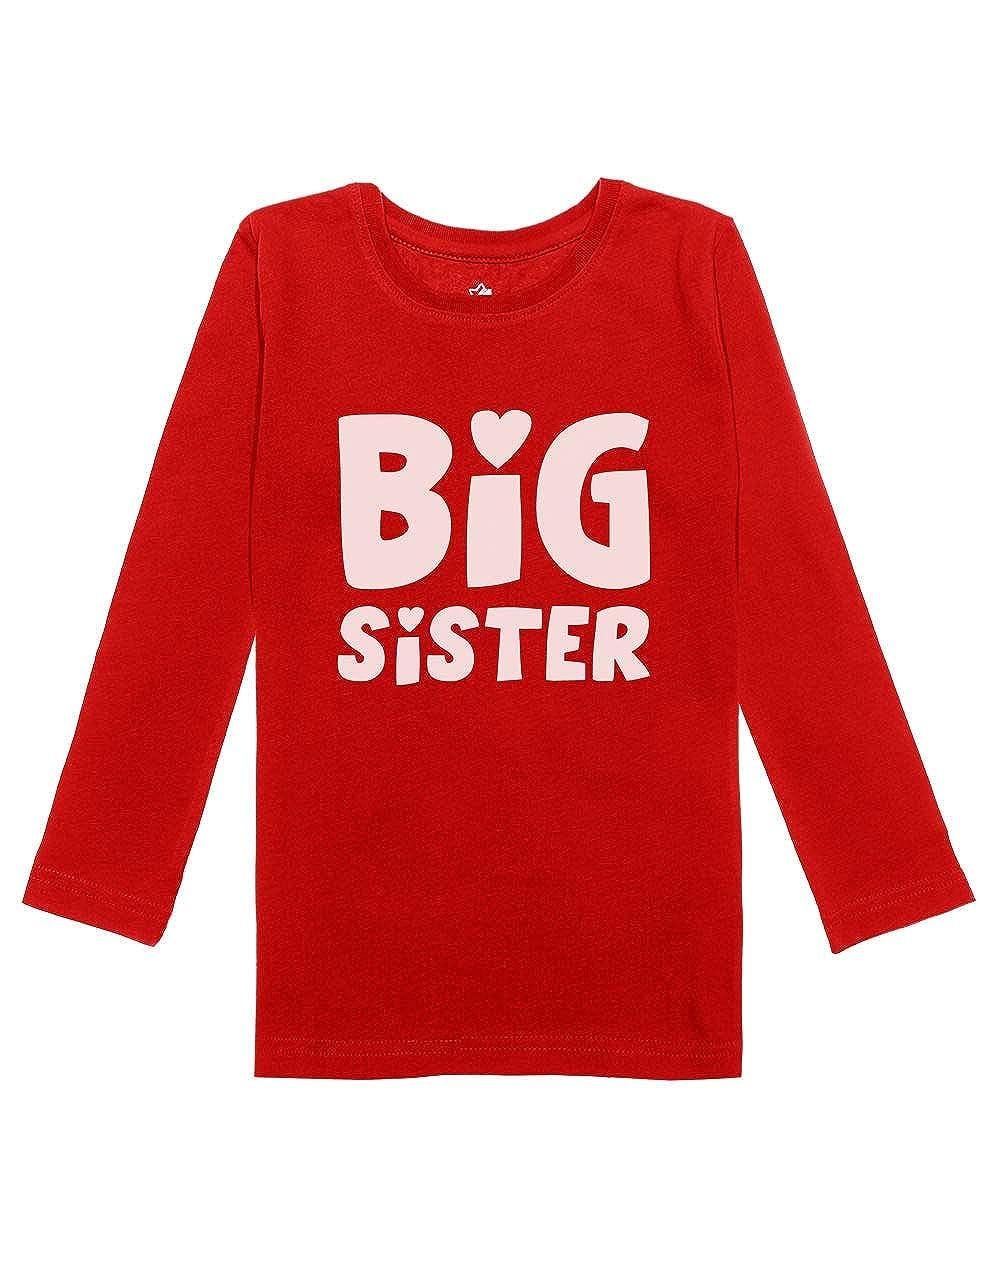 Big Sister - Elder Sibling Gift Idea Cute Girls Toddler Long Sleeve Fitted T-Shirt GM0thagCw